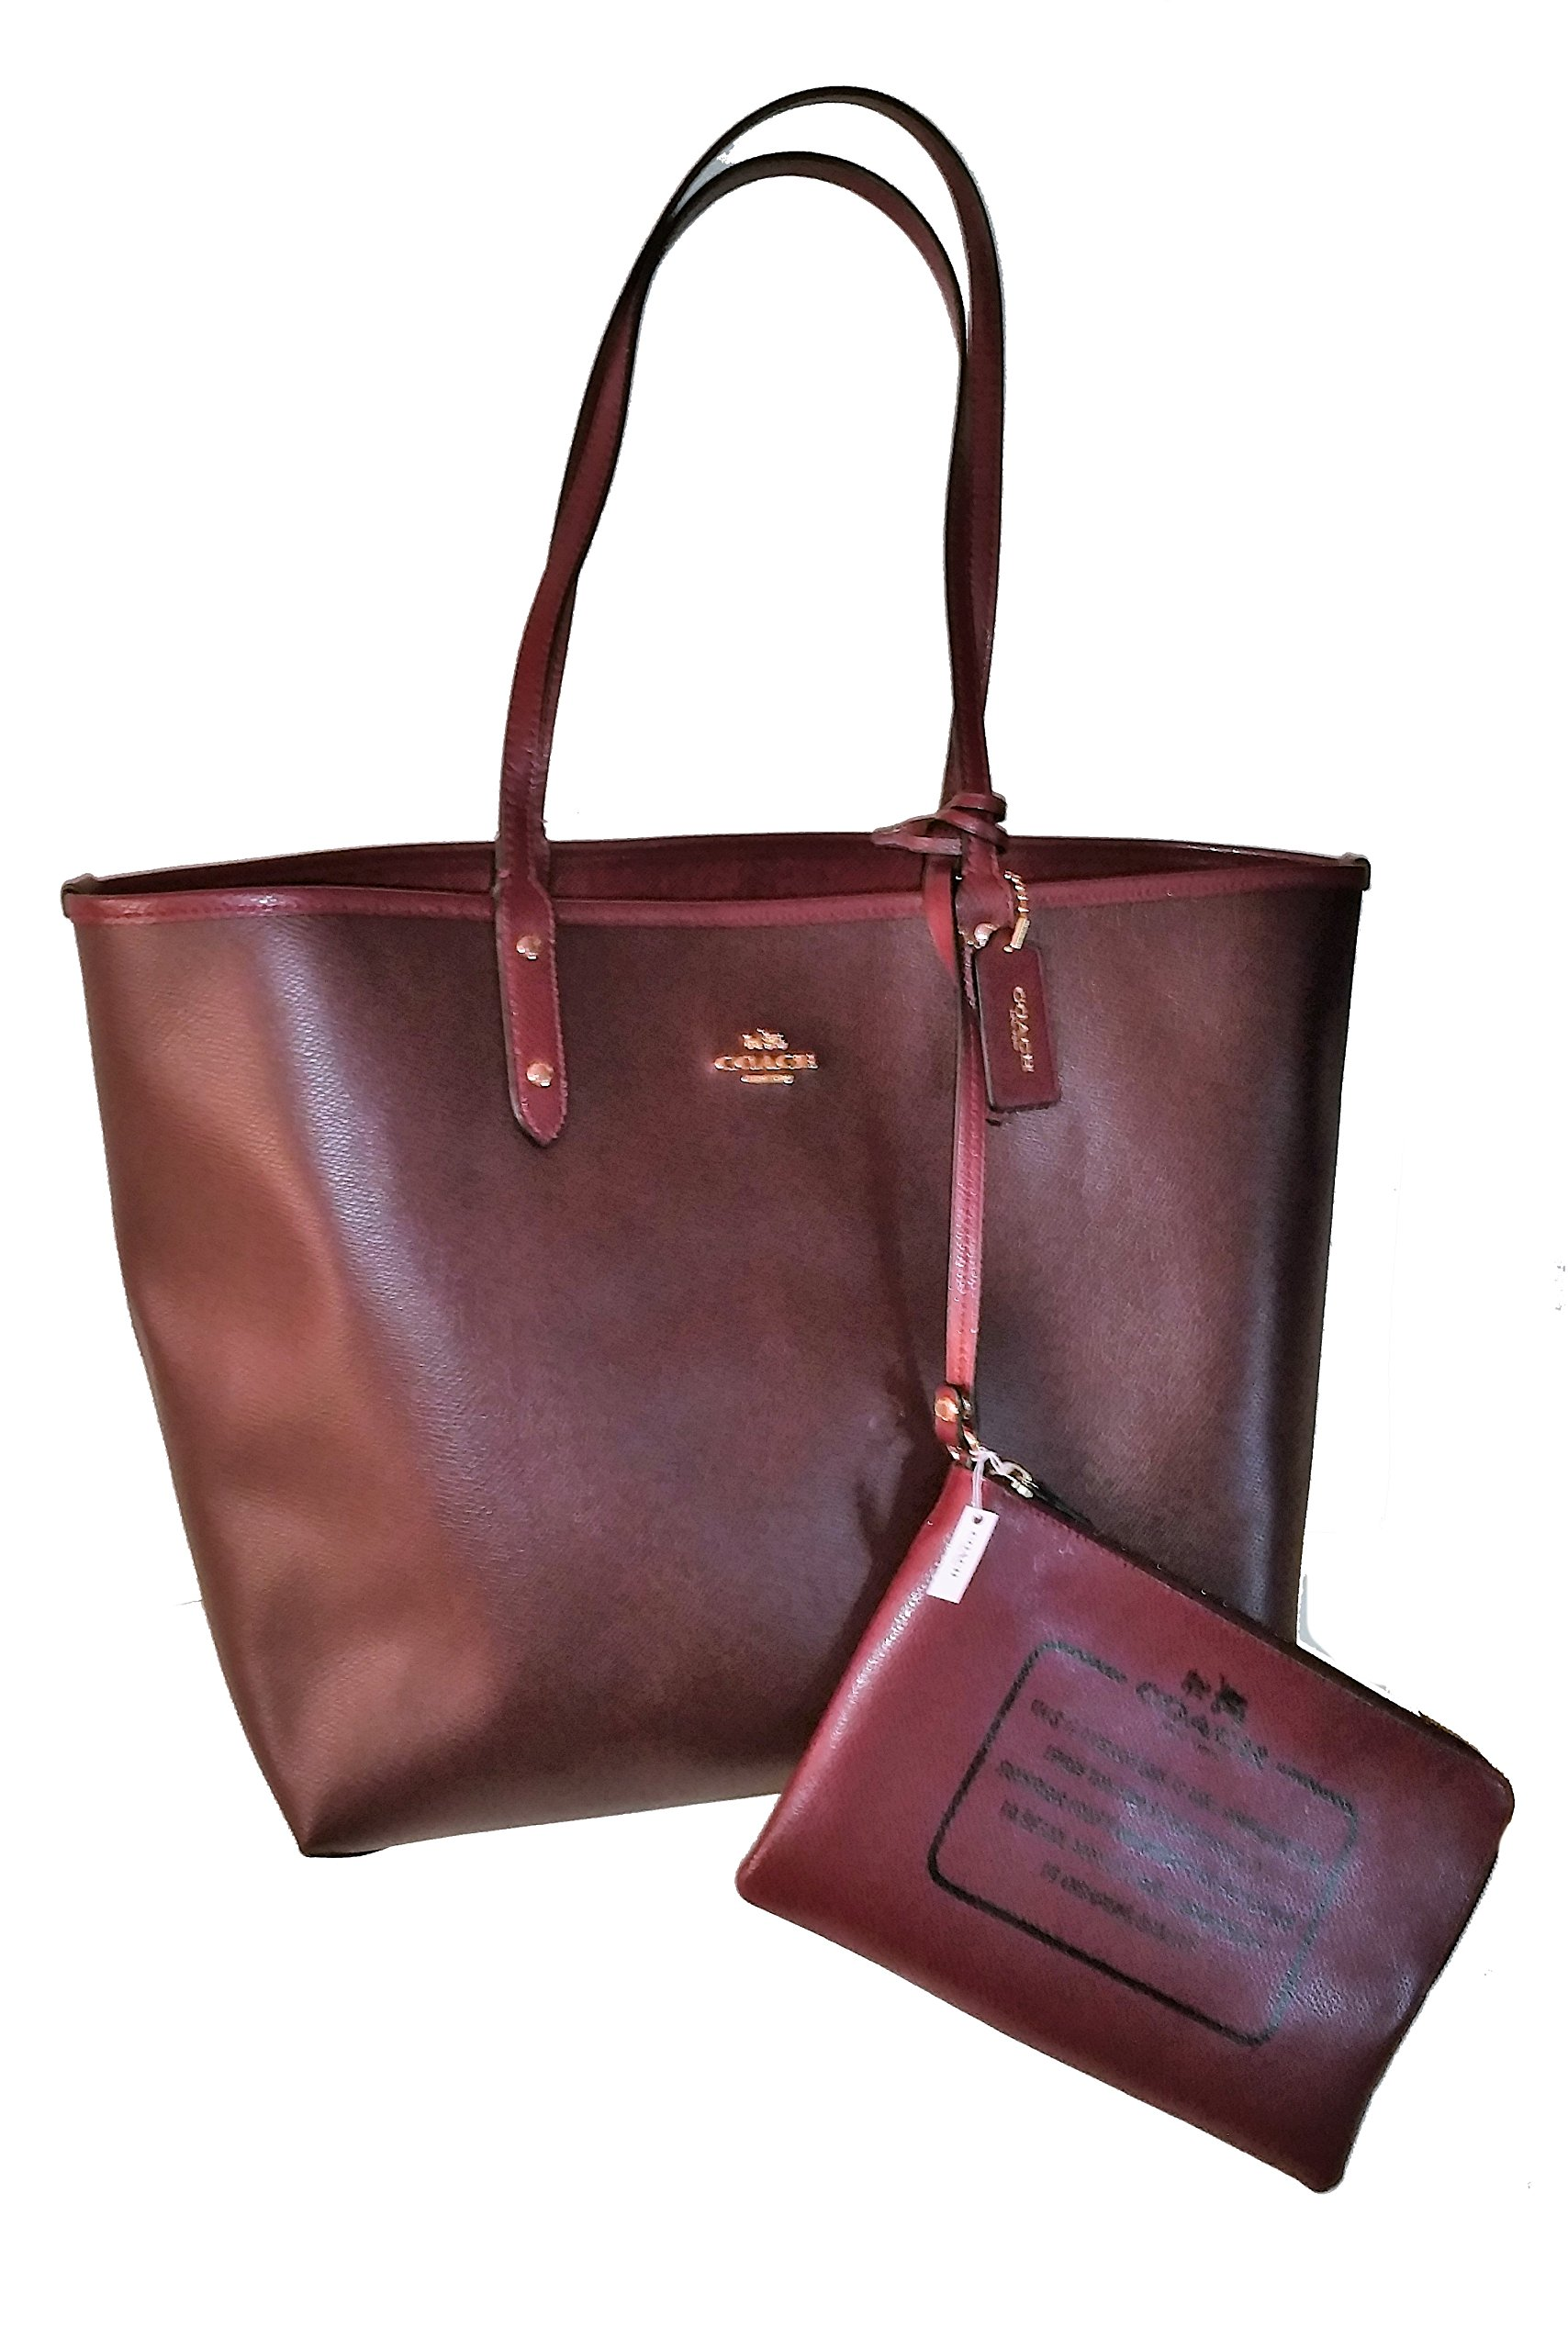 Coach Solid PVC Reversible City Signature Tote Handbag Oxblood, Burgundy